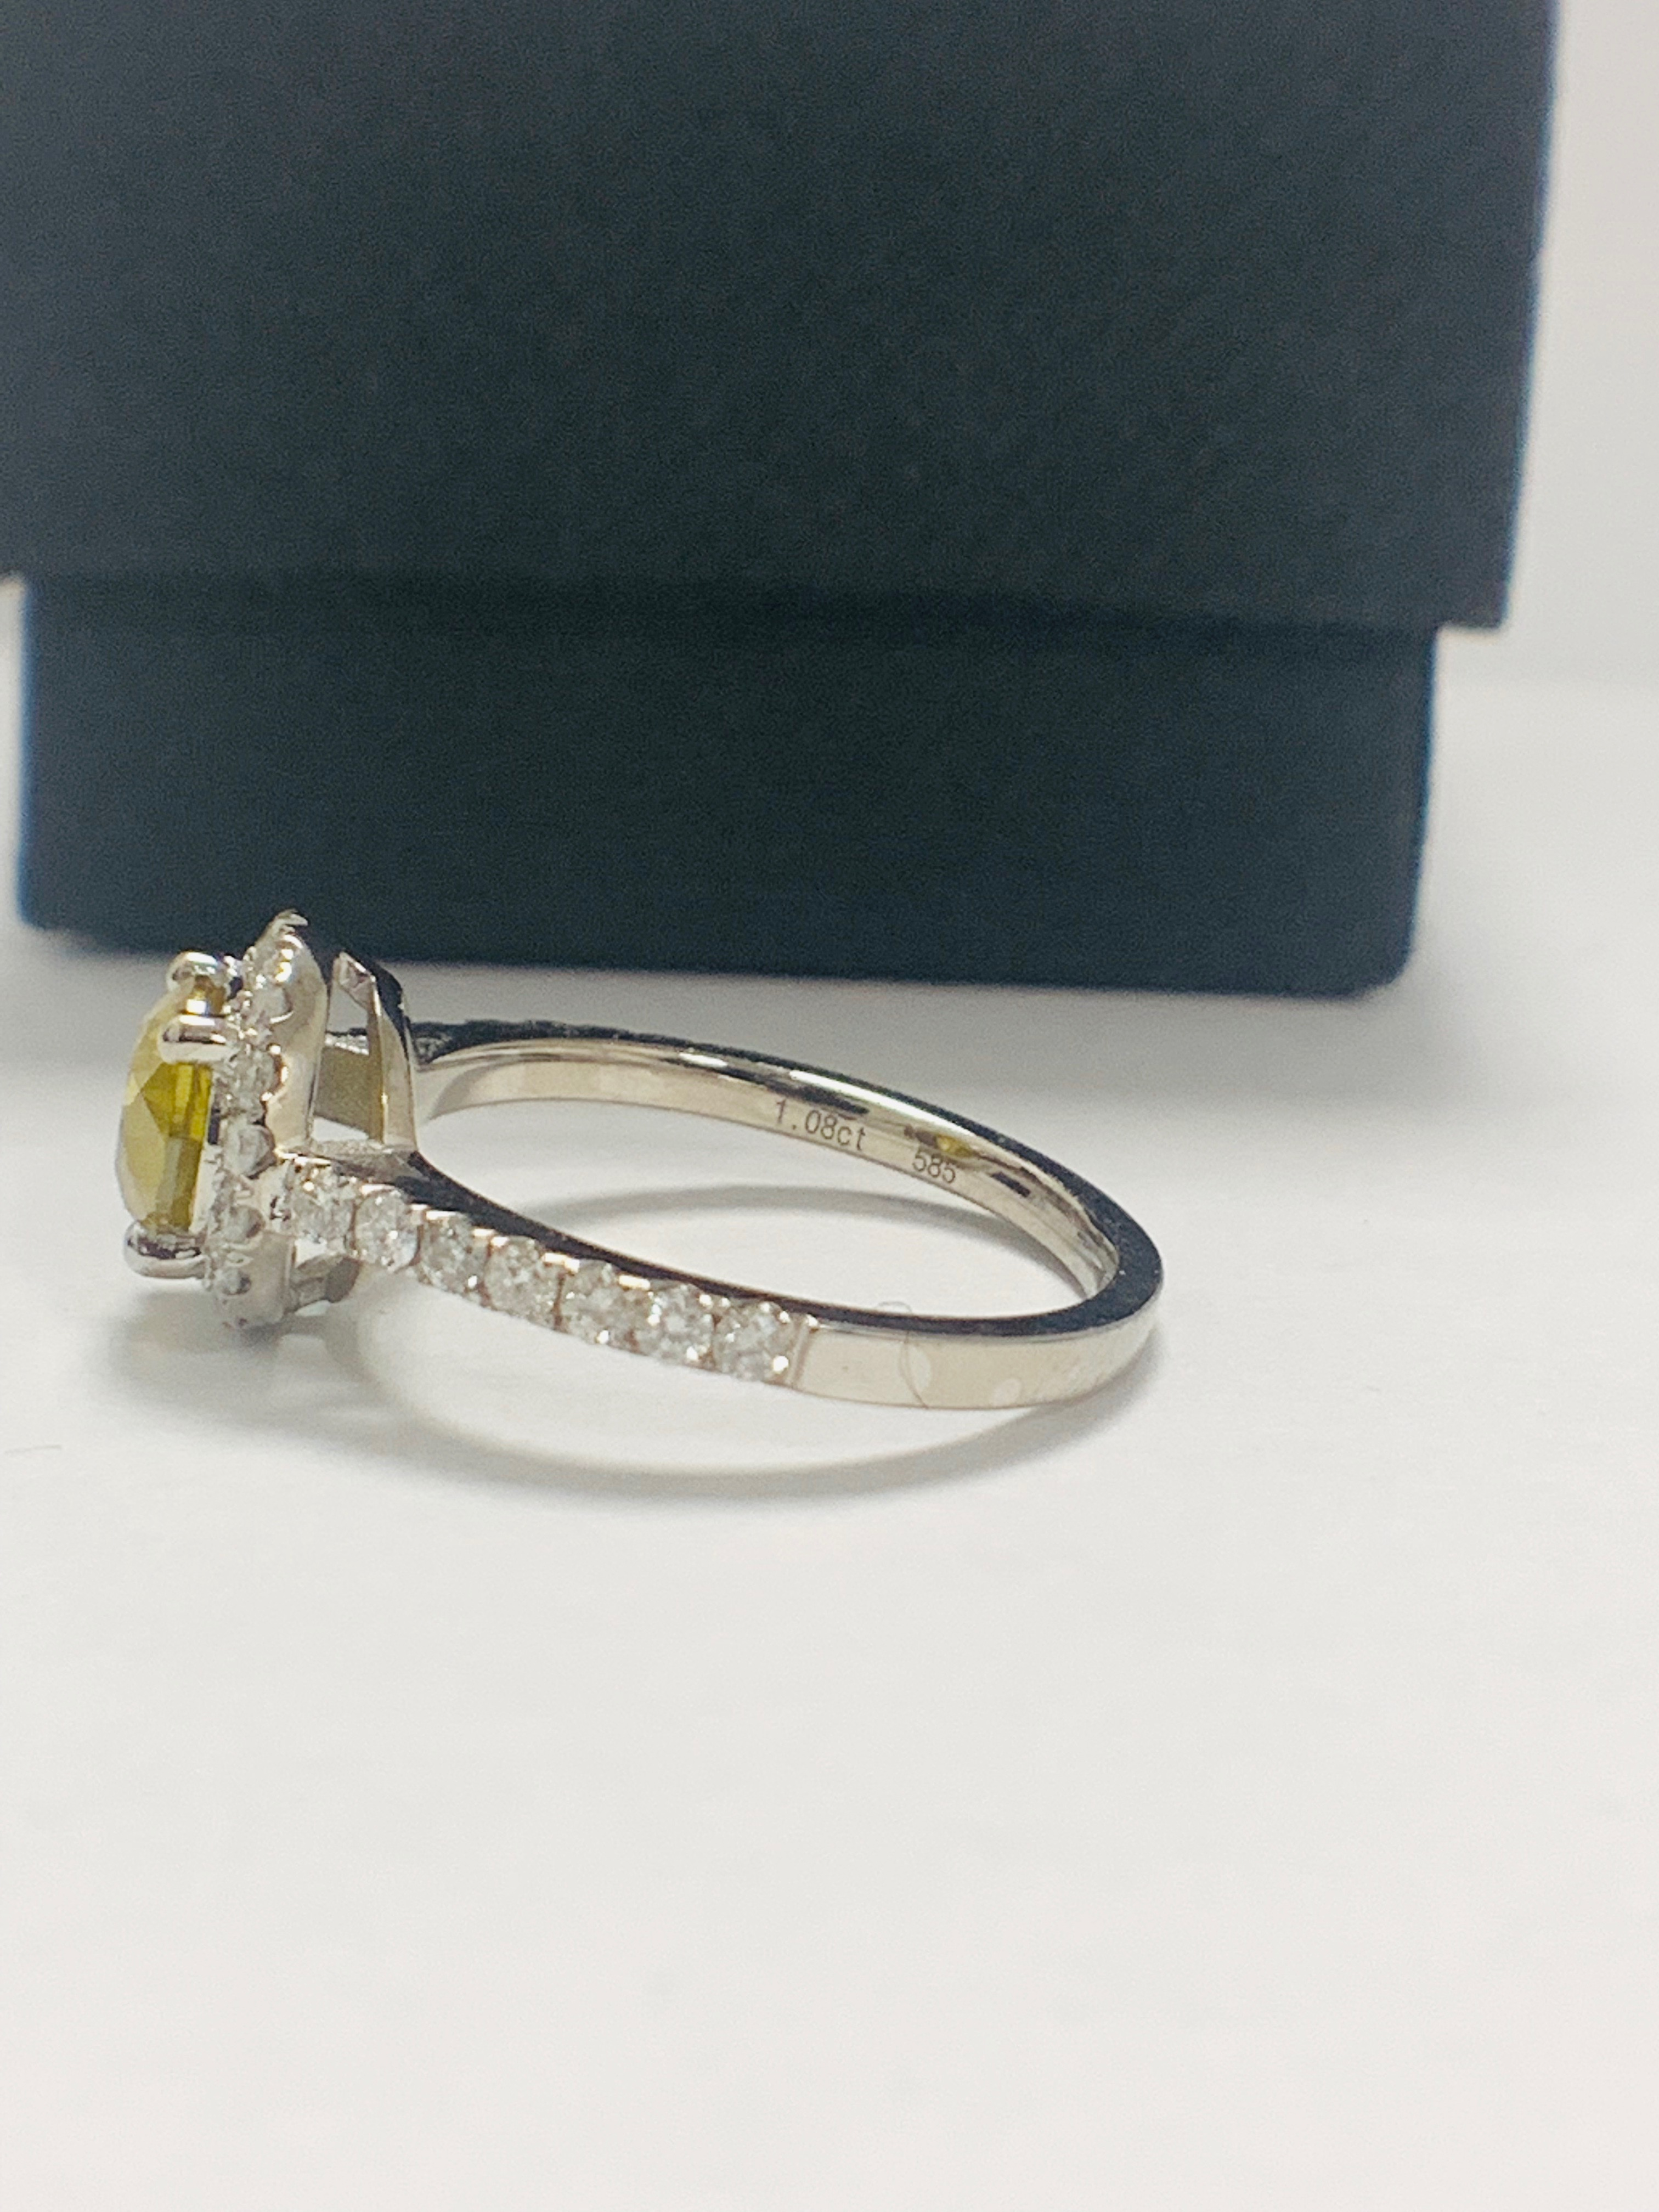 14ct White Gold Diamond ring featuring centre, round brilliant cut, yellow Diamond (1.08ct) - Image 3 of 12